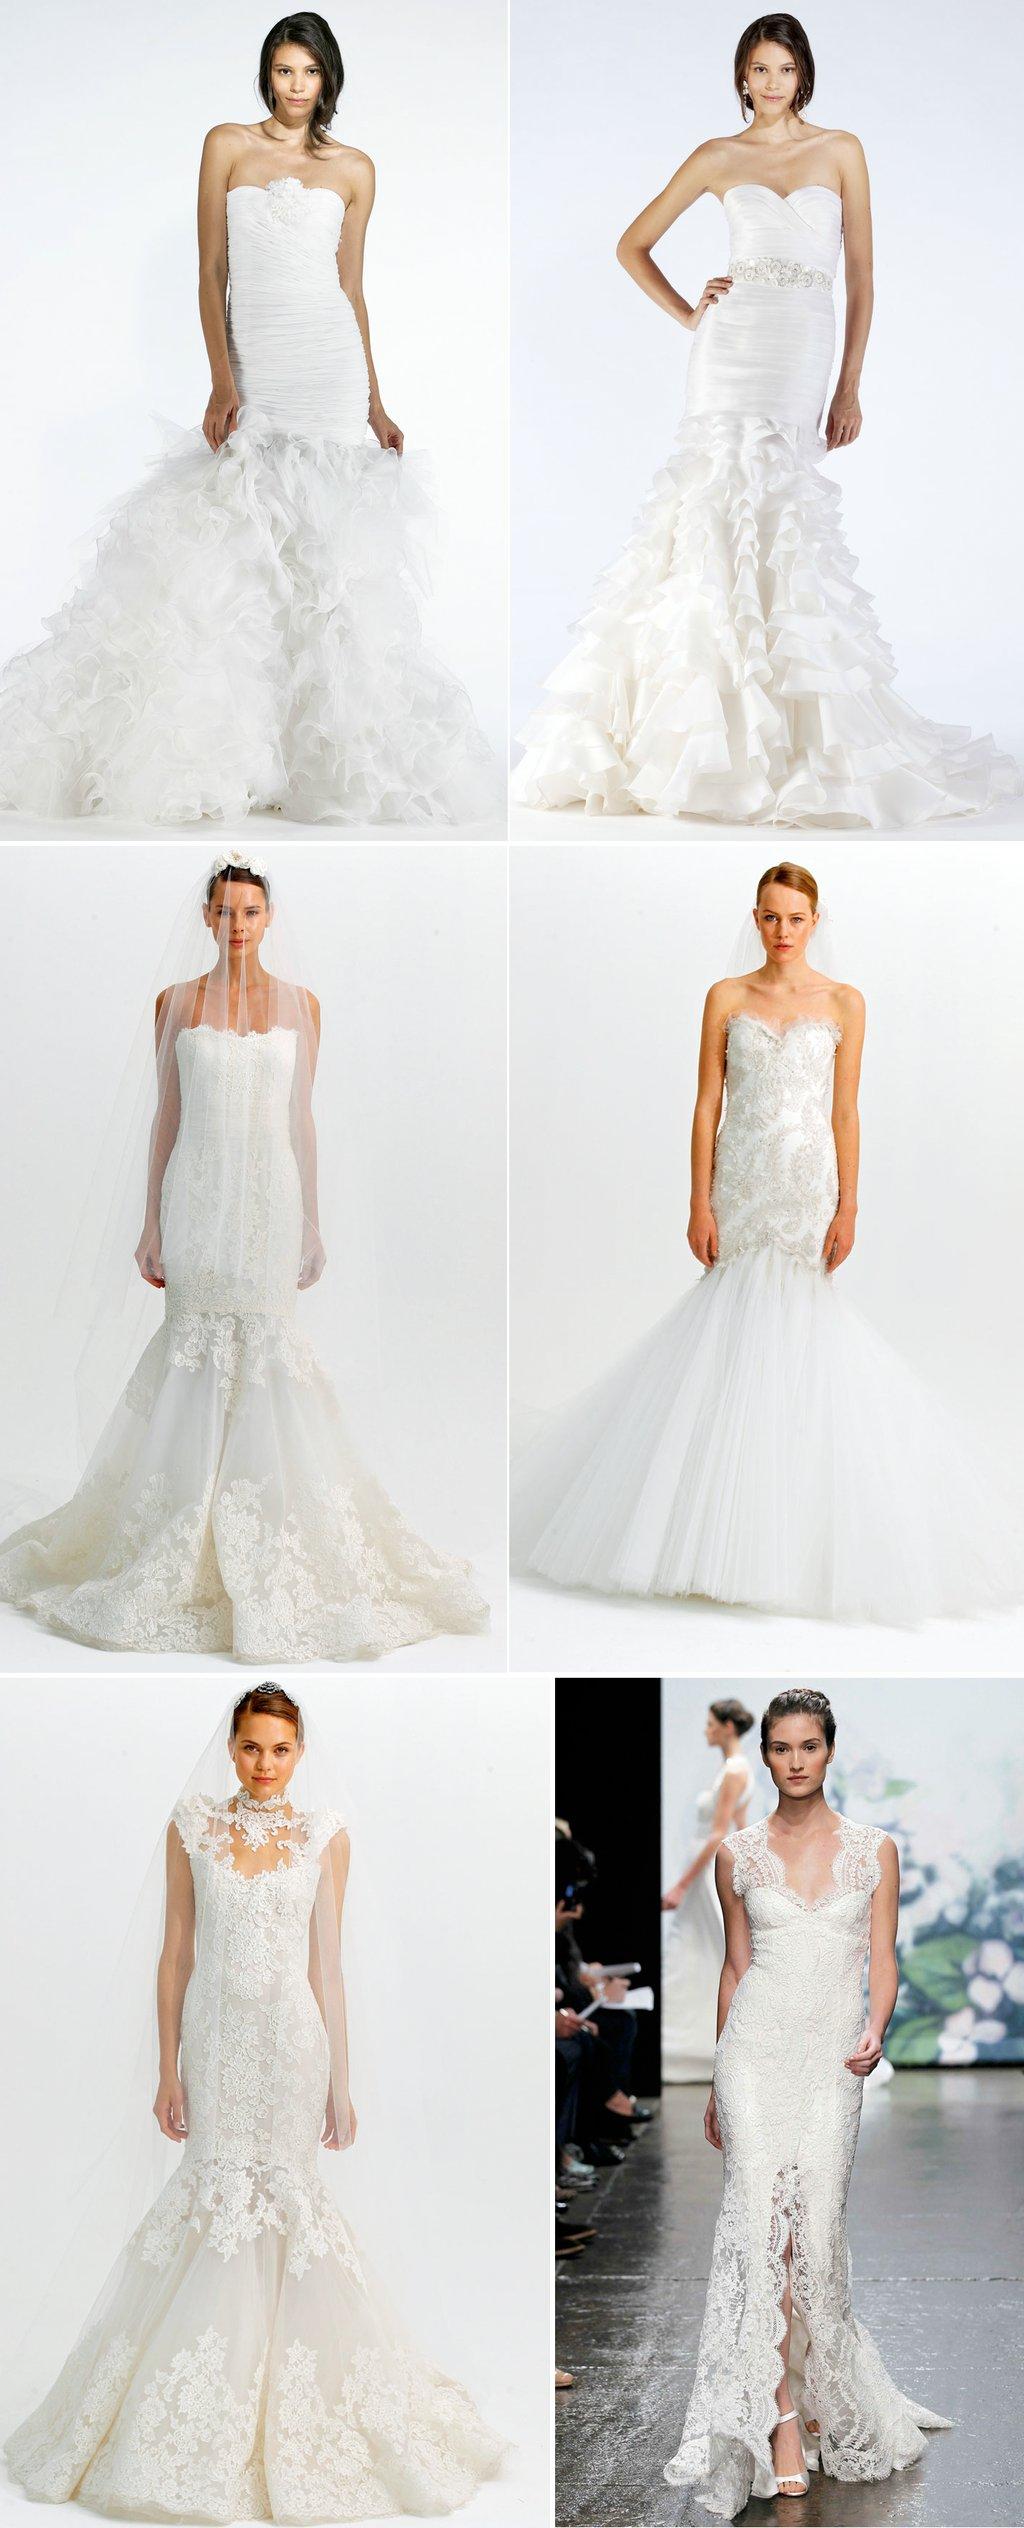 2012-wedding-dresses-mermaid-bridal-gown-monique-lhuillier-marchesa-oscar-de-la-renta.full